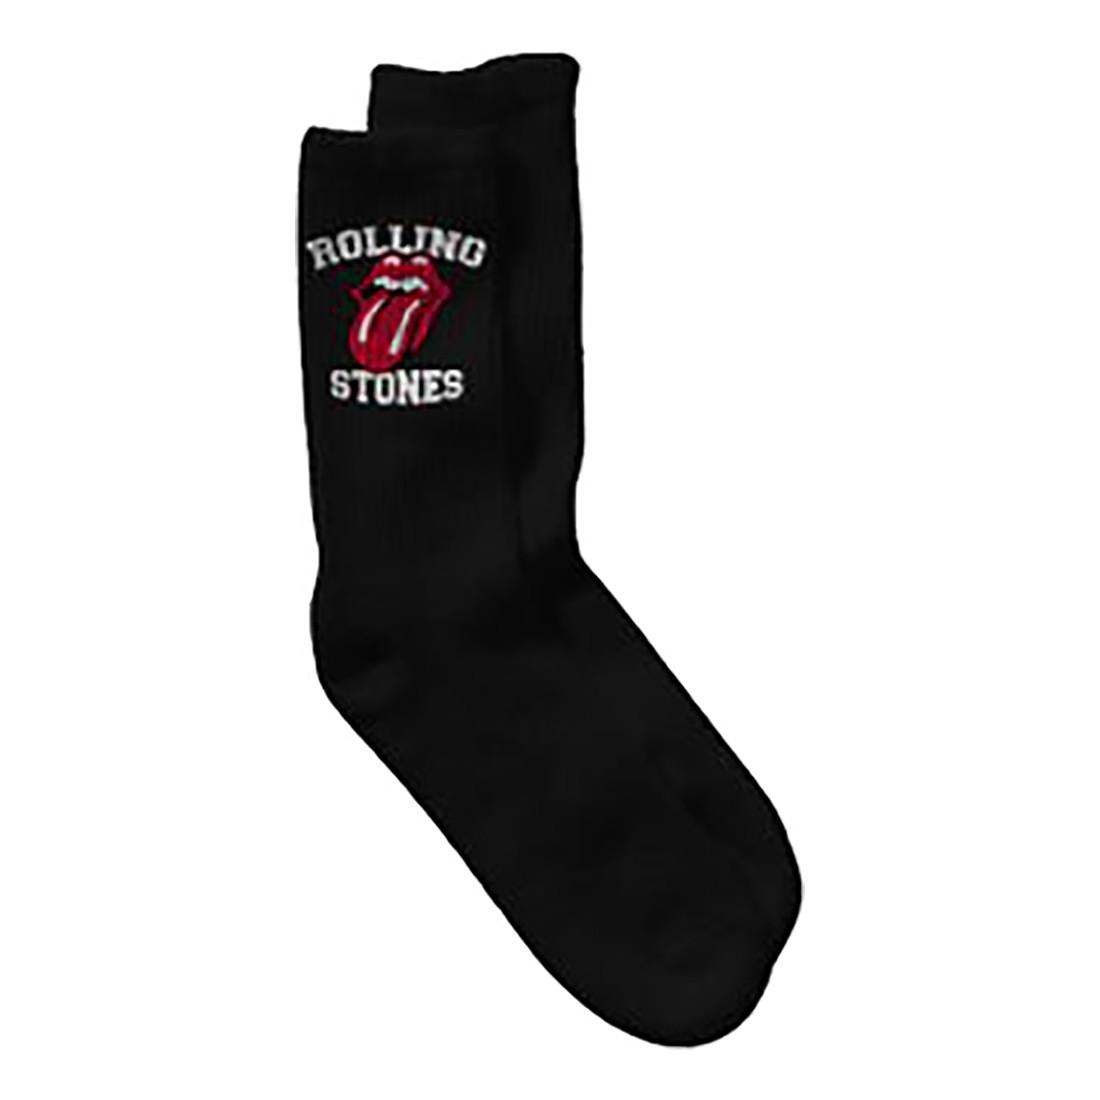 Rolling Stones Tongue Logo Socks